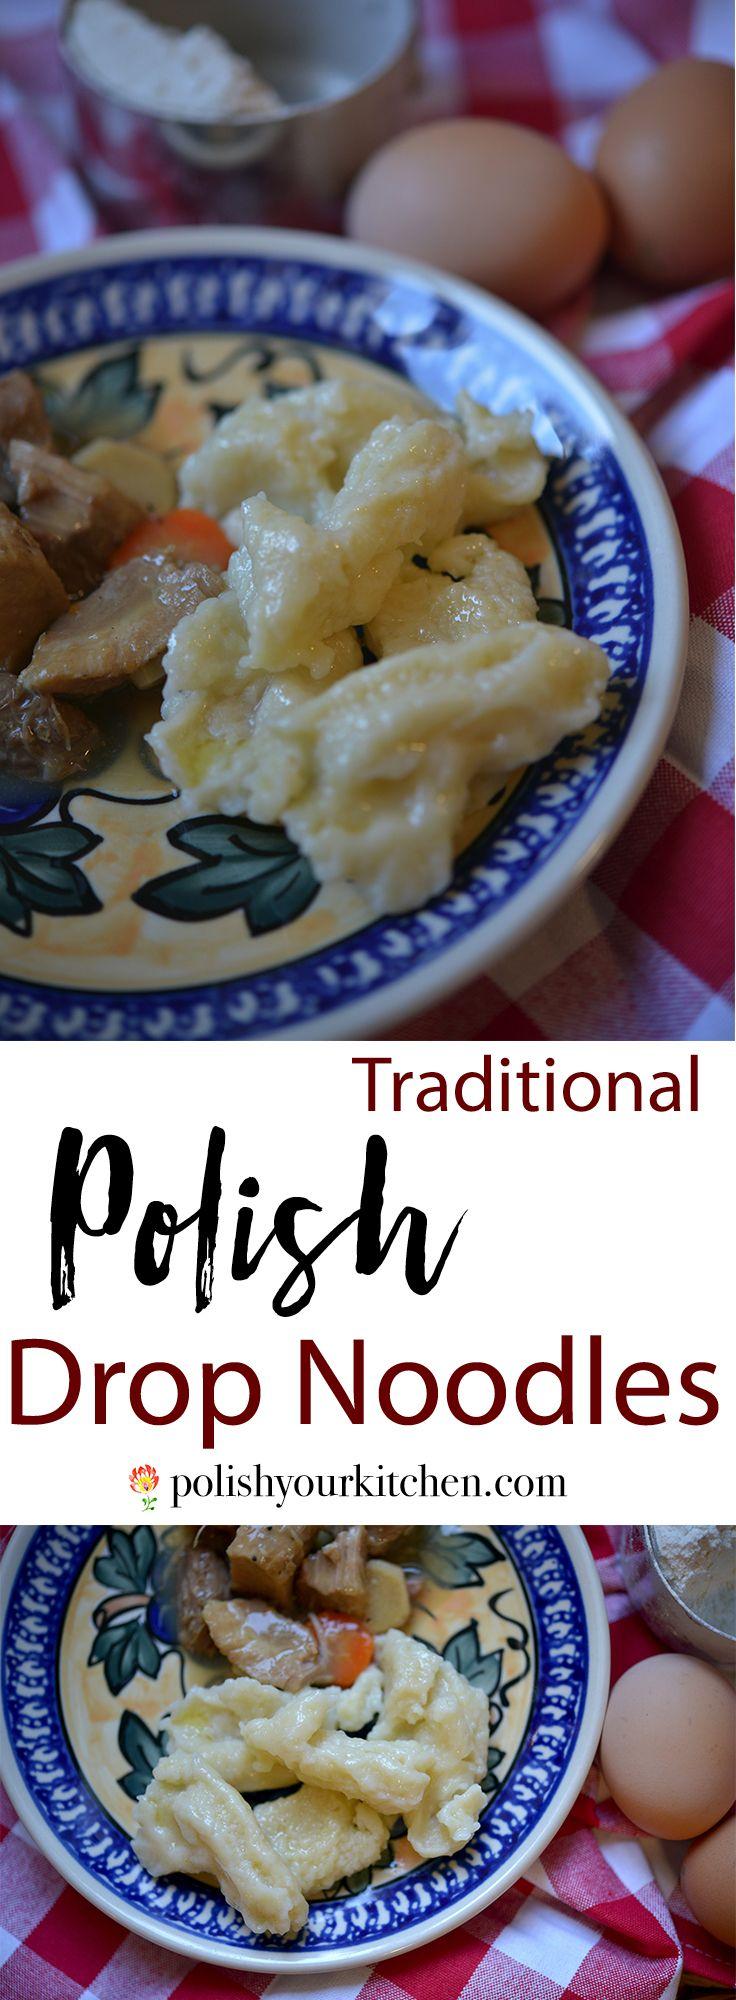 Traditional Polish Drop Noodles recipe